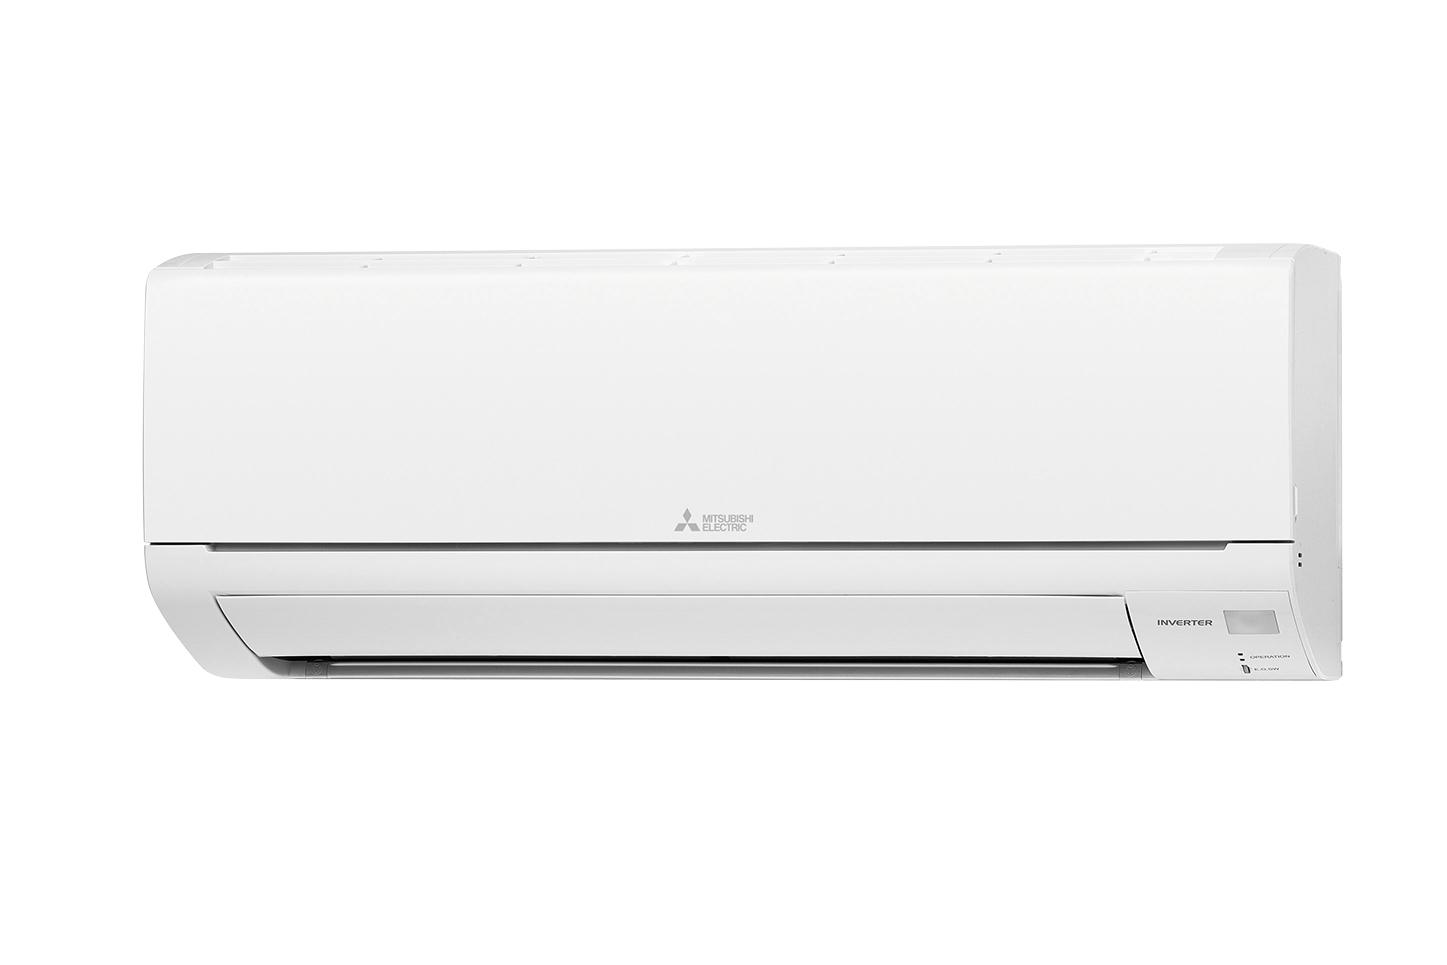 Mitsubishi Heating Cooling Wall Unit : Mitsubishi electric wall split air conditioning needham